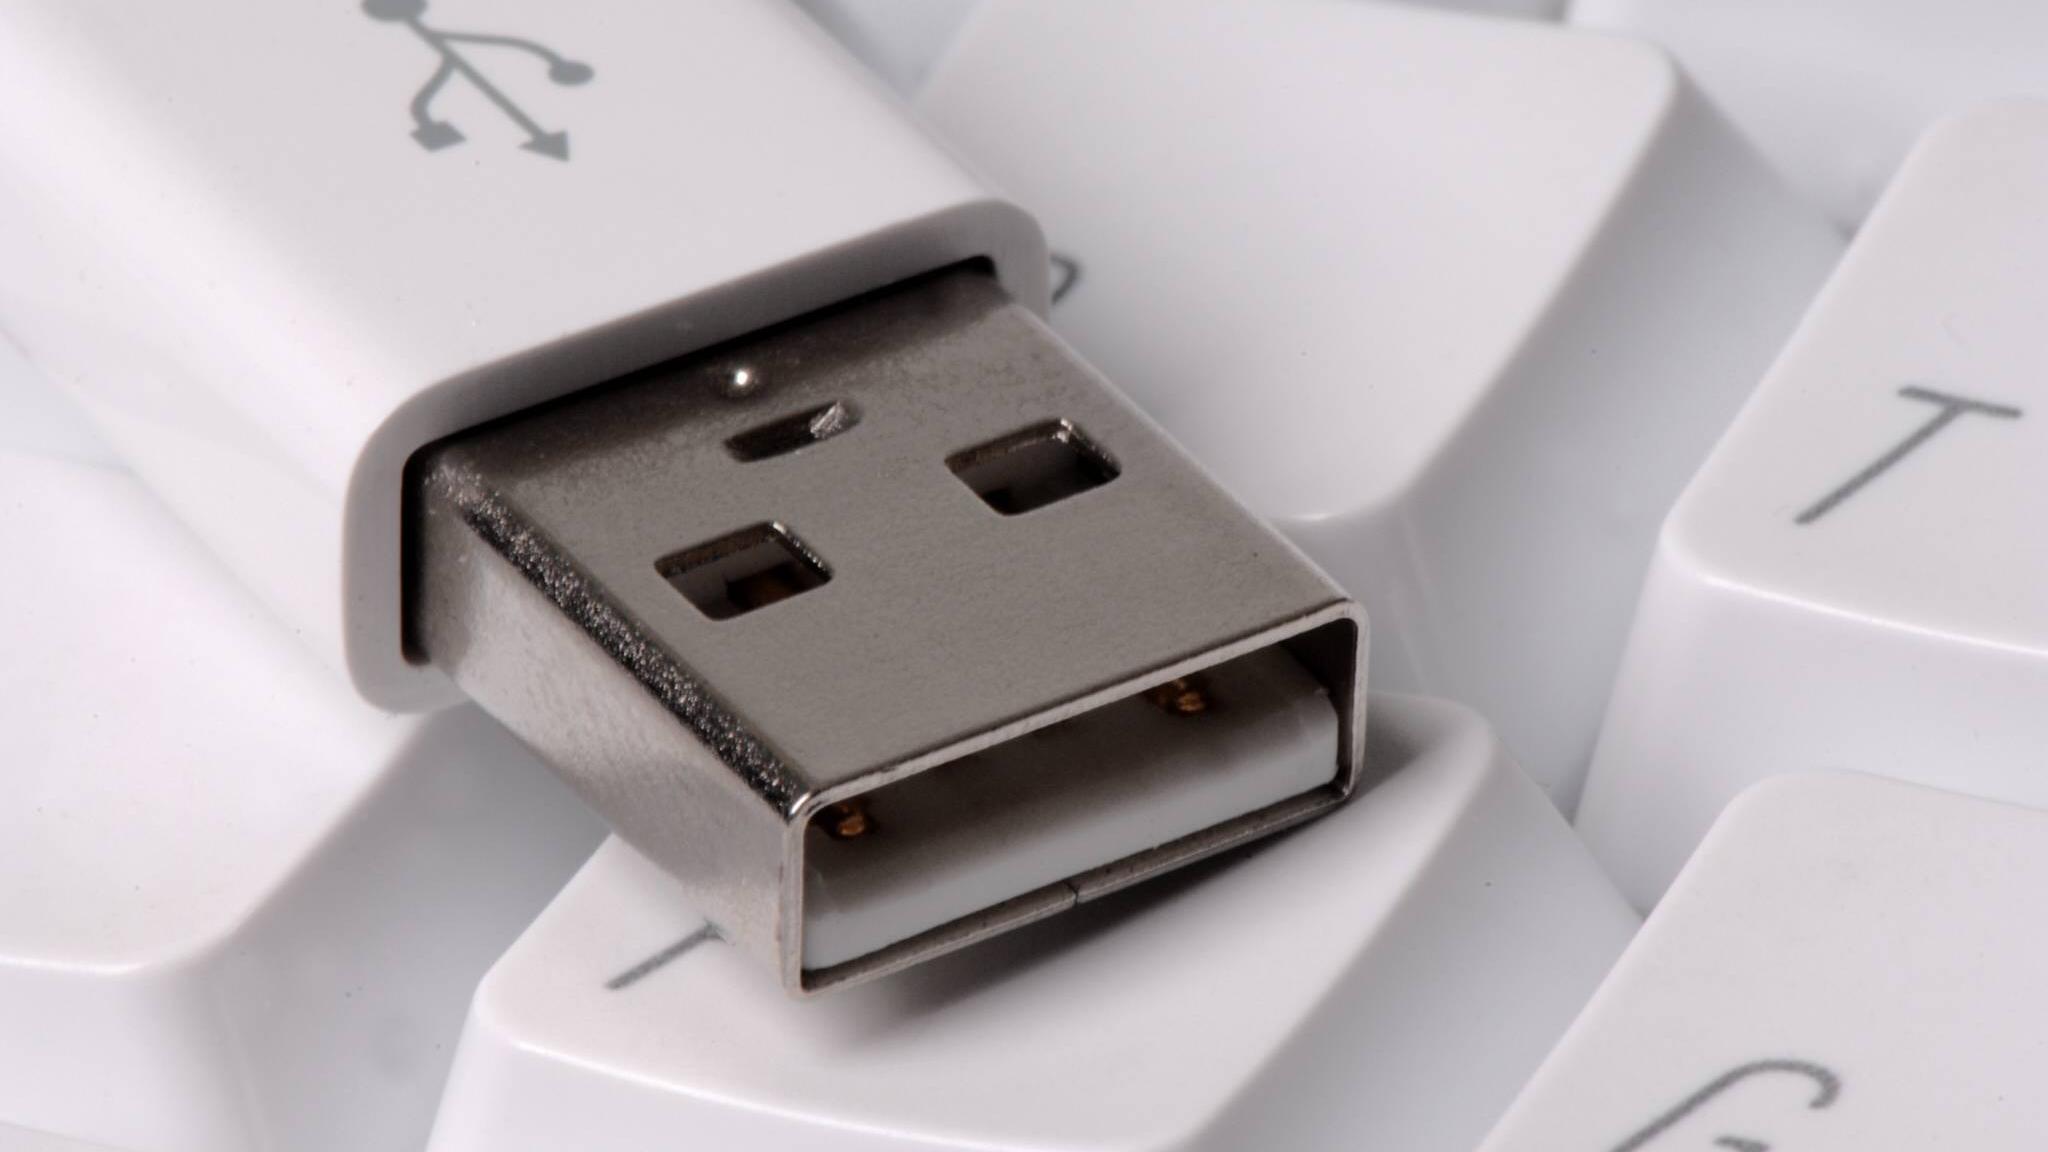 Windows 10 lässt sich auch via USB-Stick reparieren.